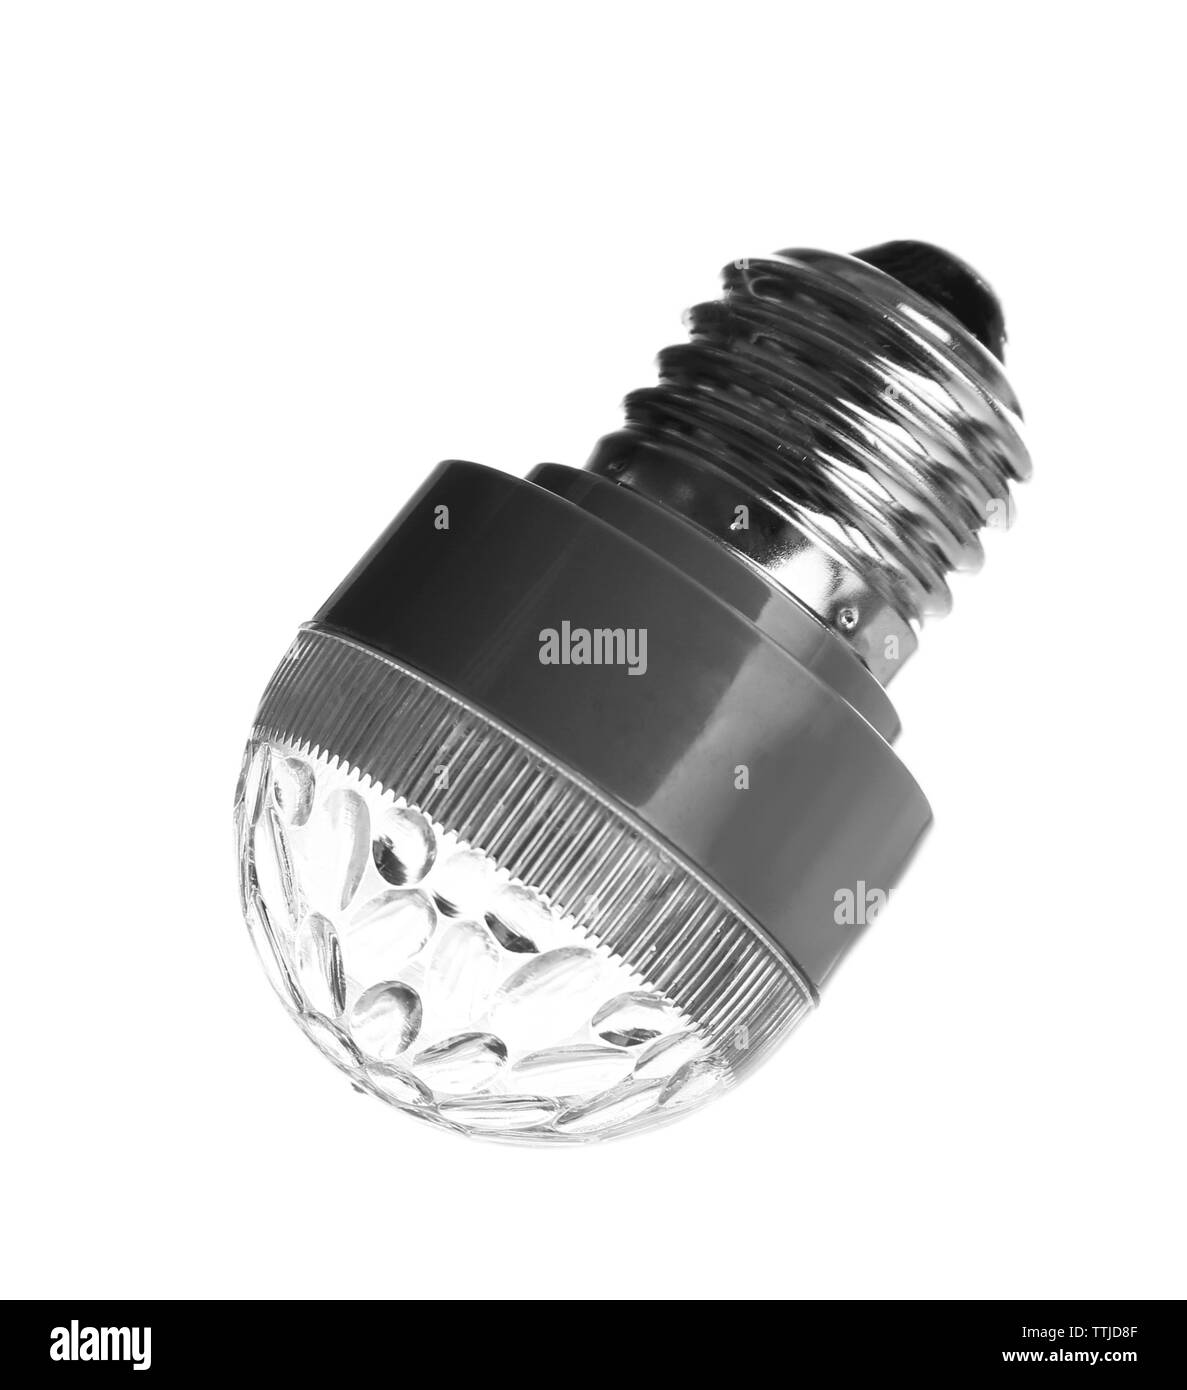 Light bulb, isolated on white - Stock Image